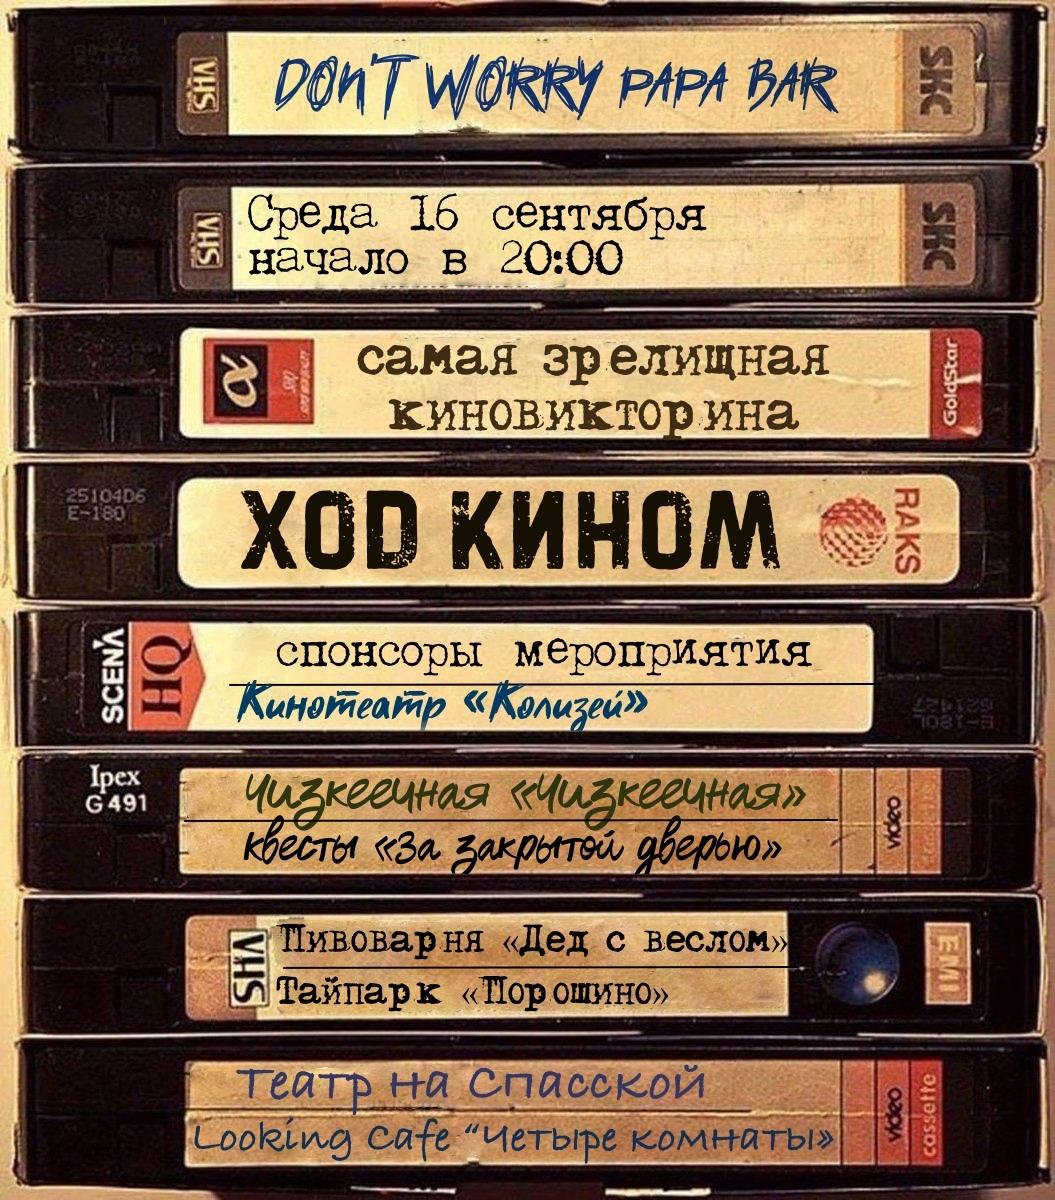 Бар «DON'T WORRY PAPA BAR» - Вконтакте